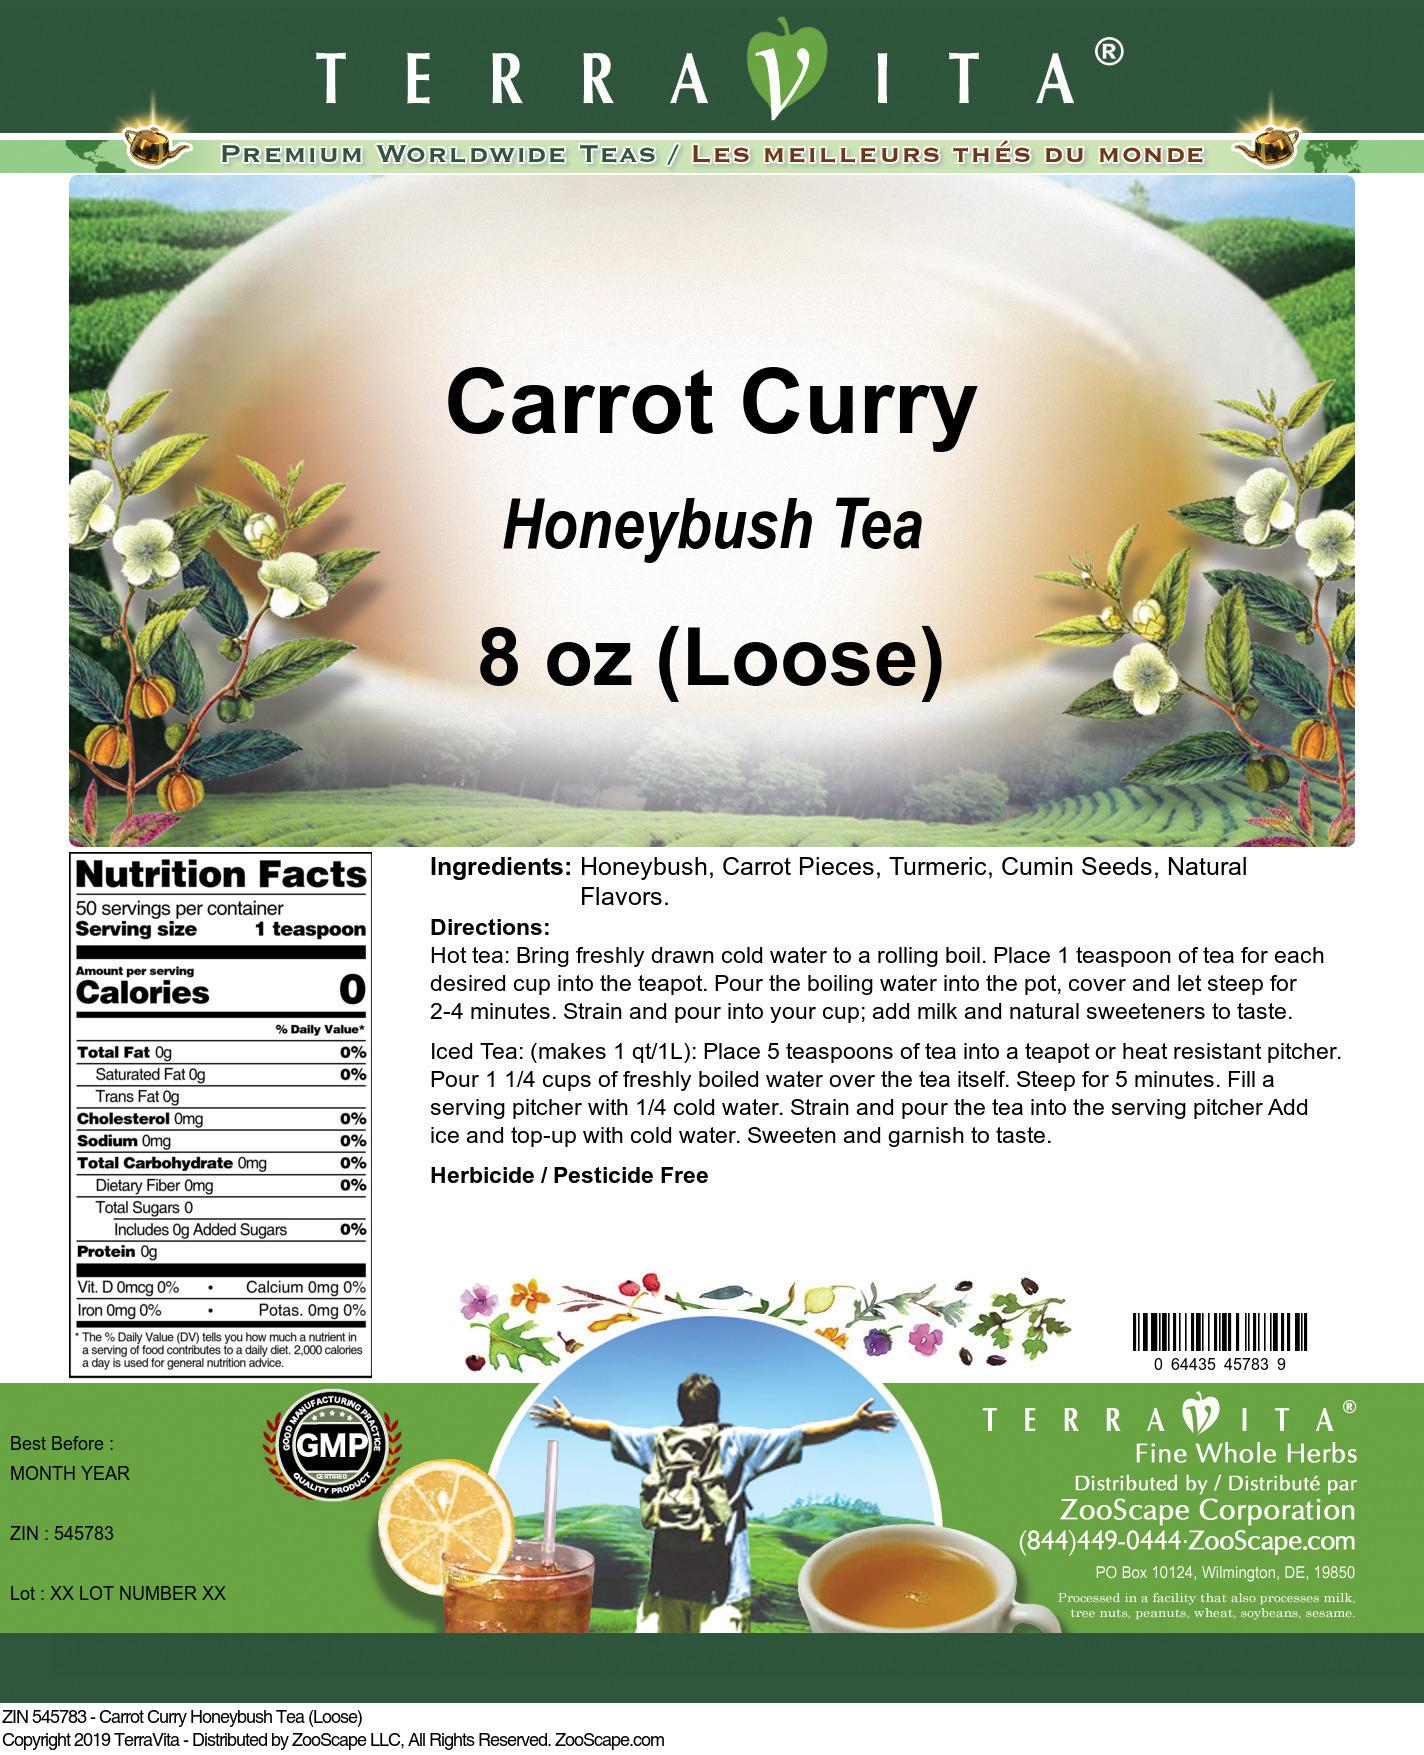 Carrot Curry Honeybush Tea